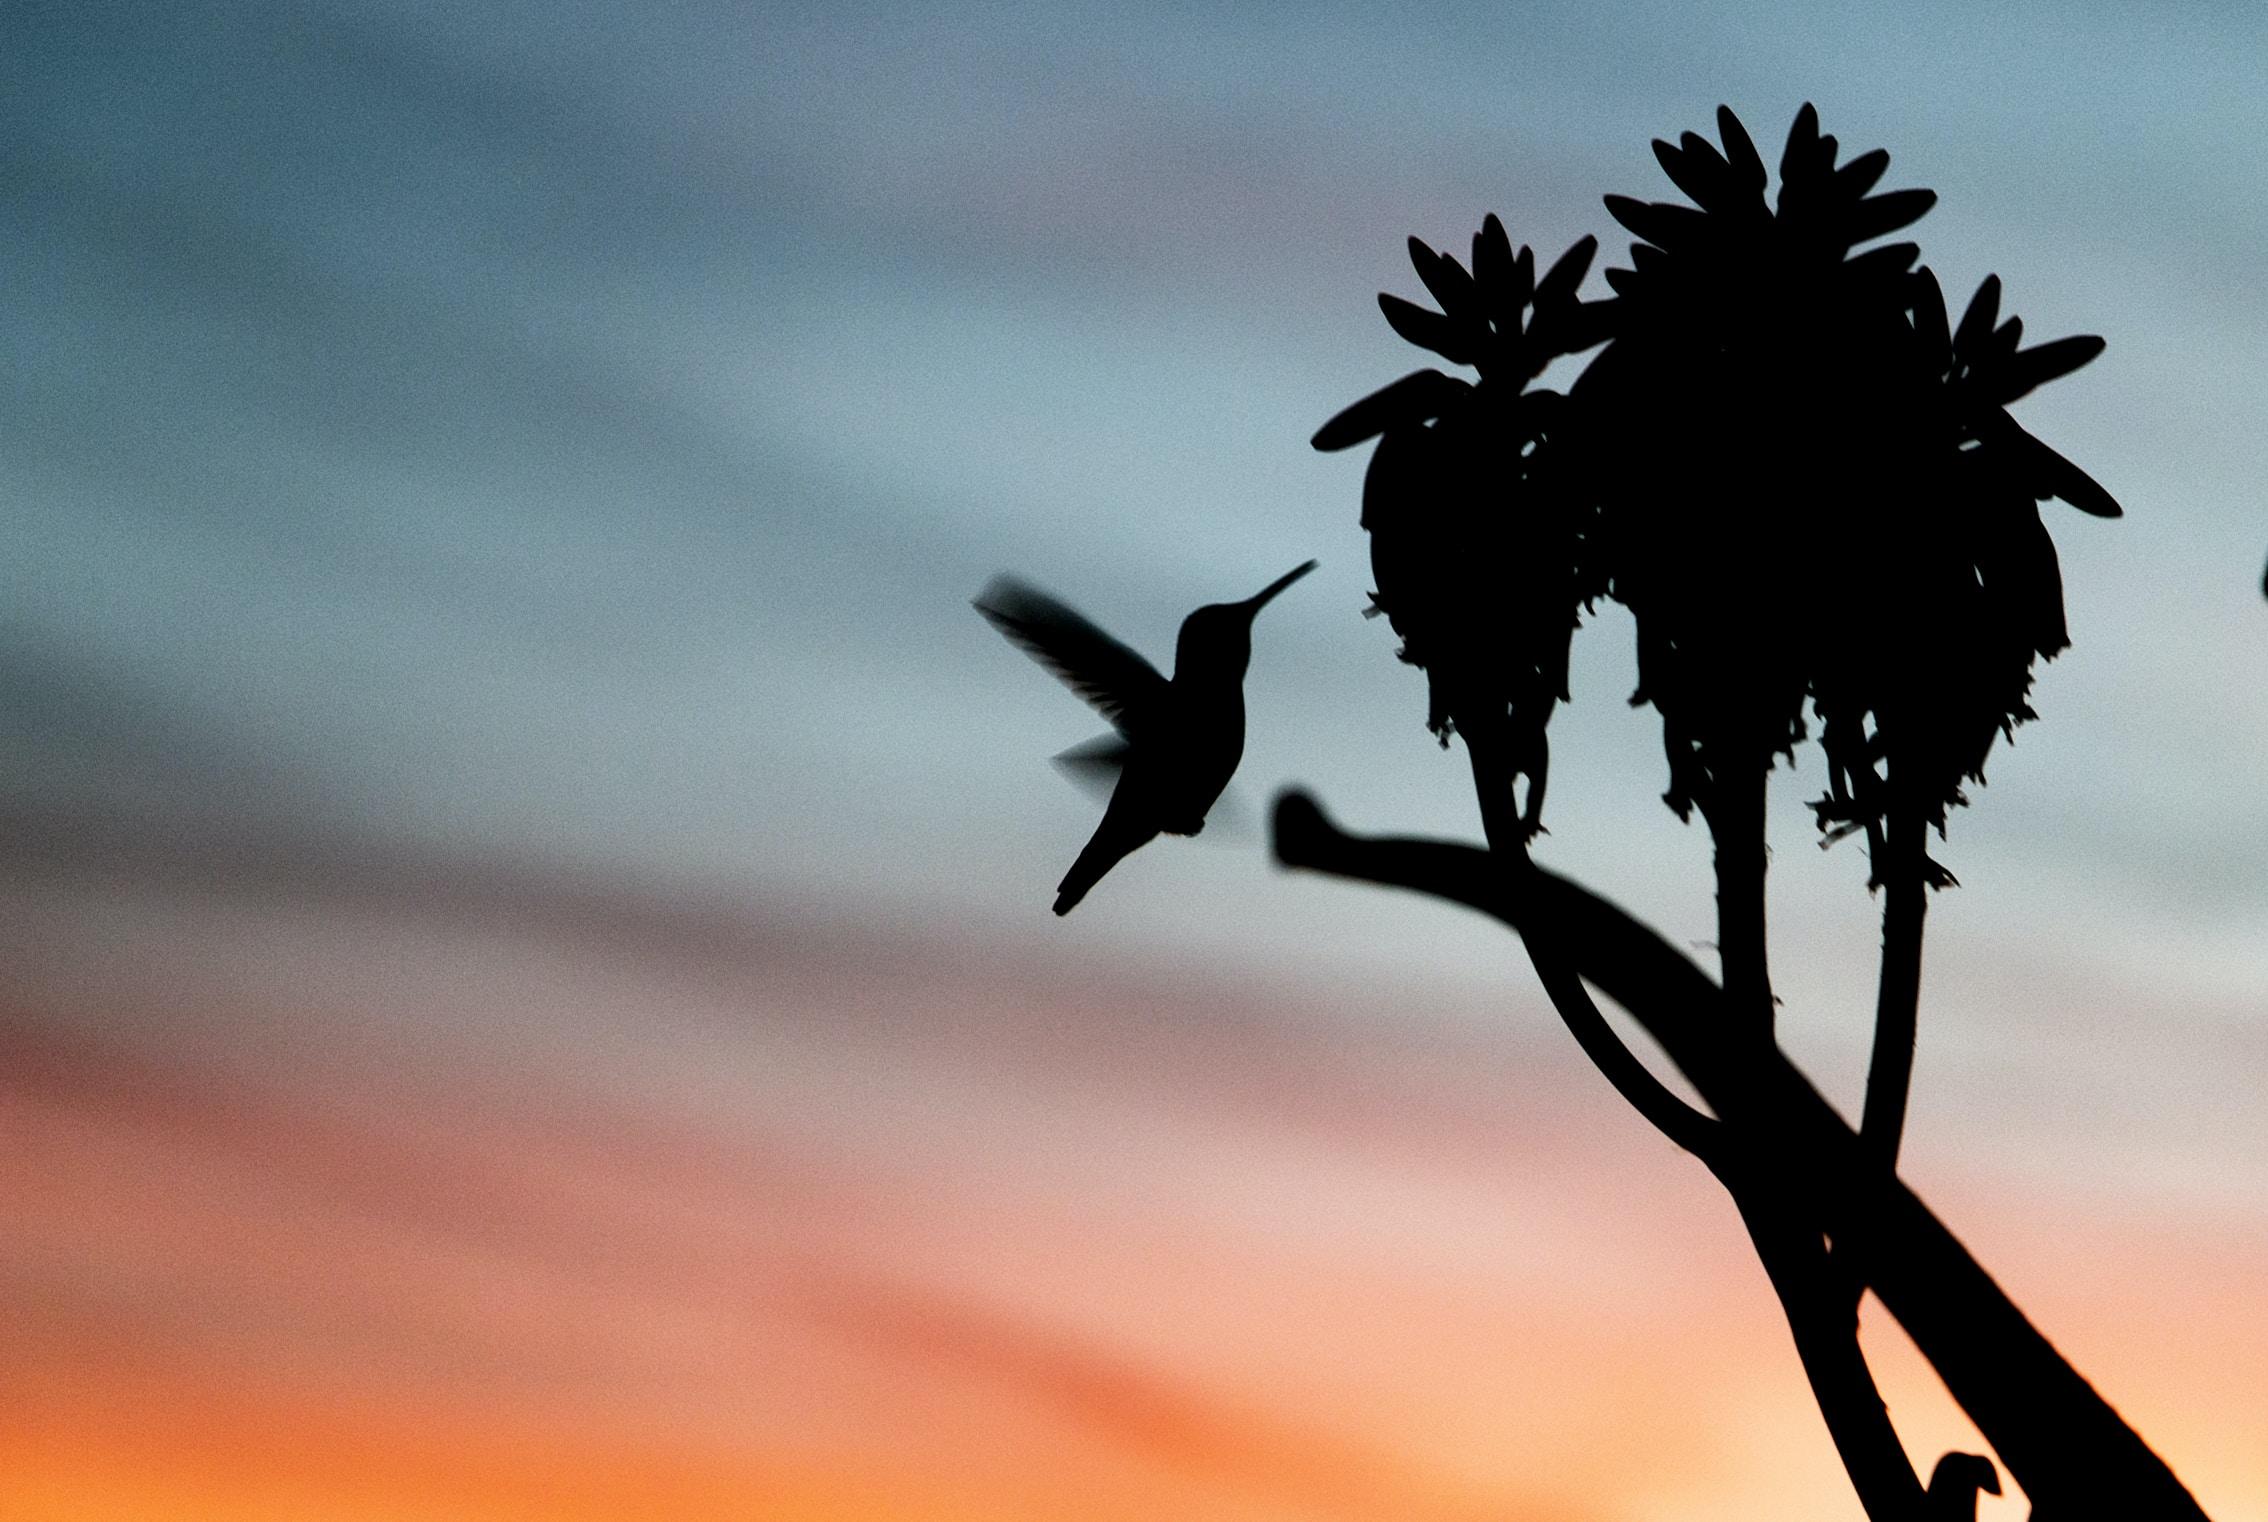 silhouette photo of hummingbird near branch